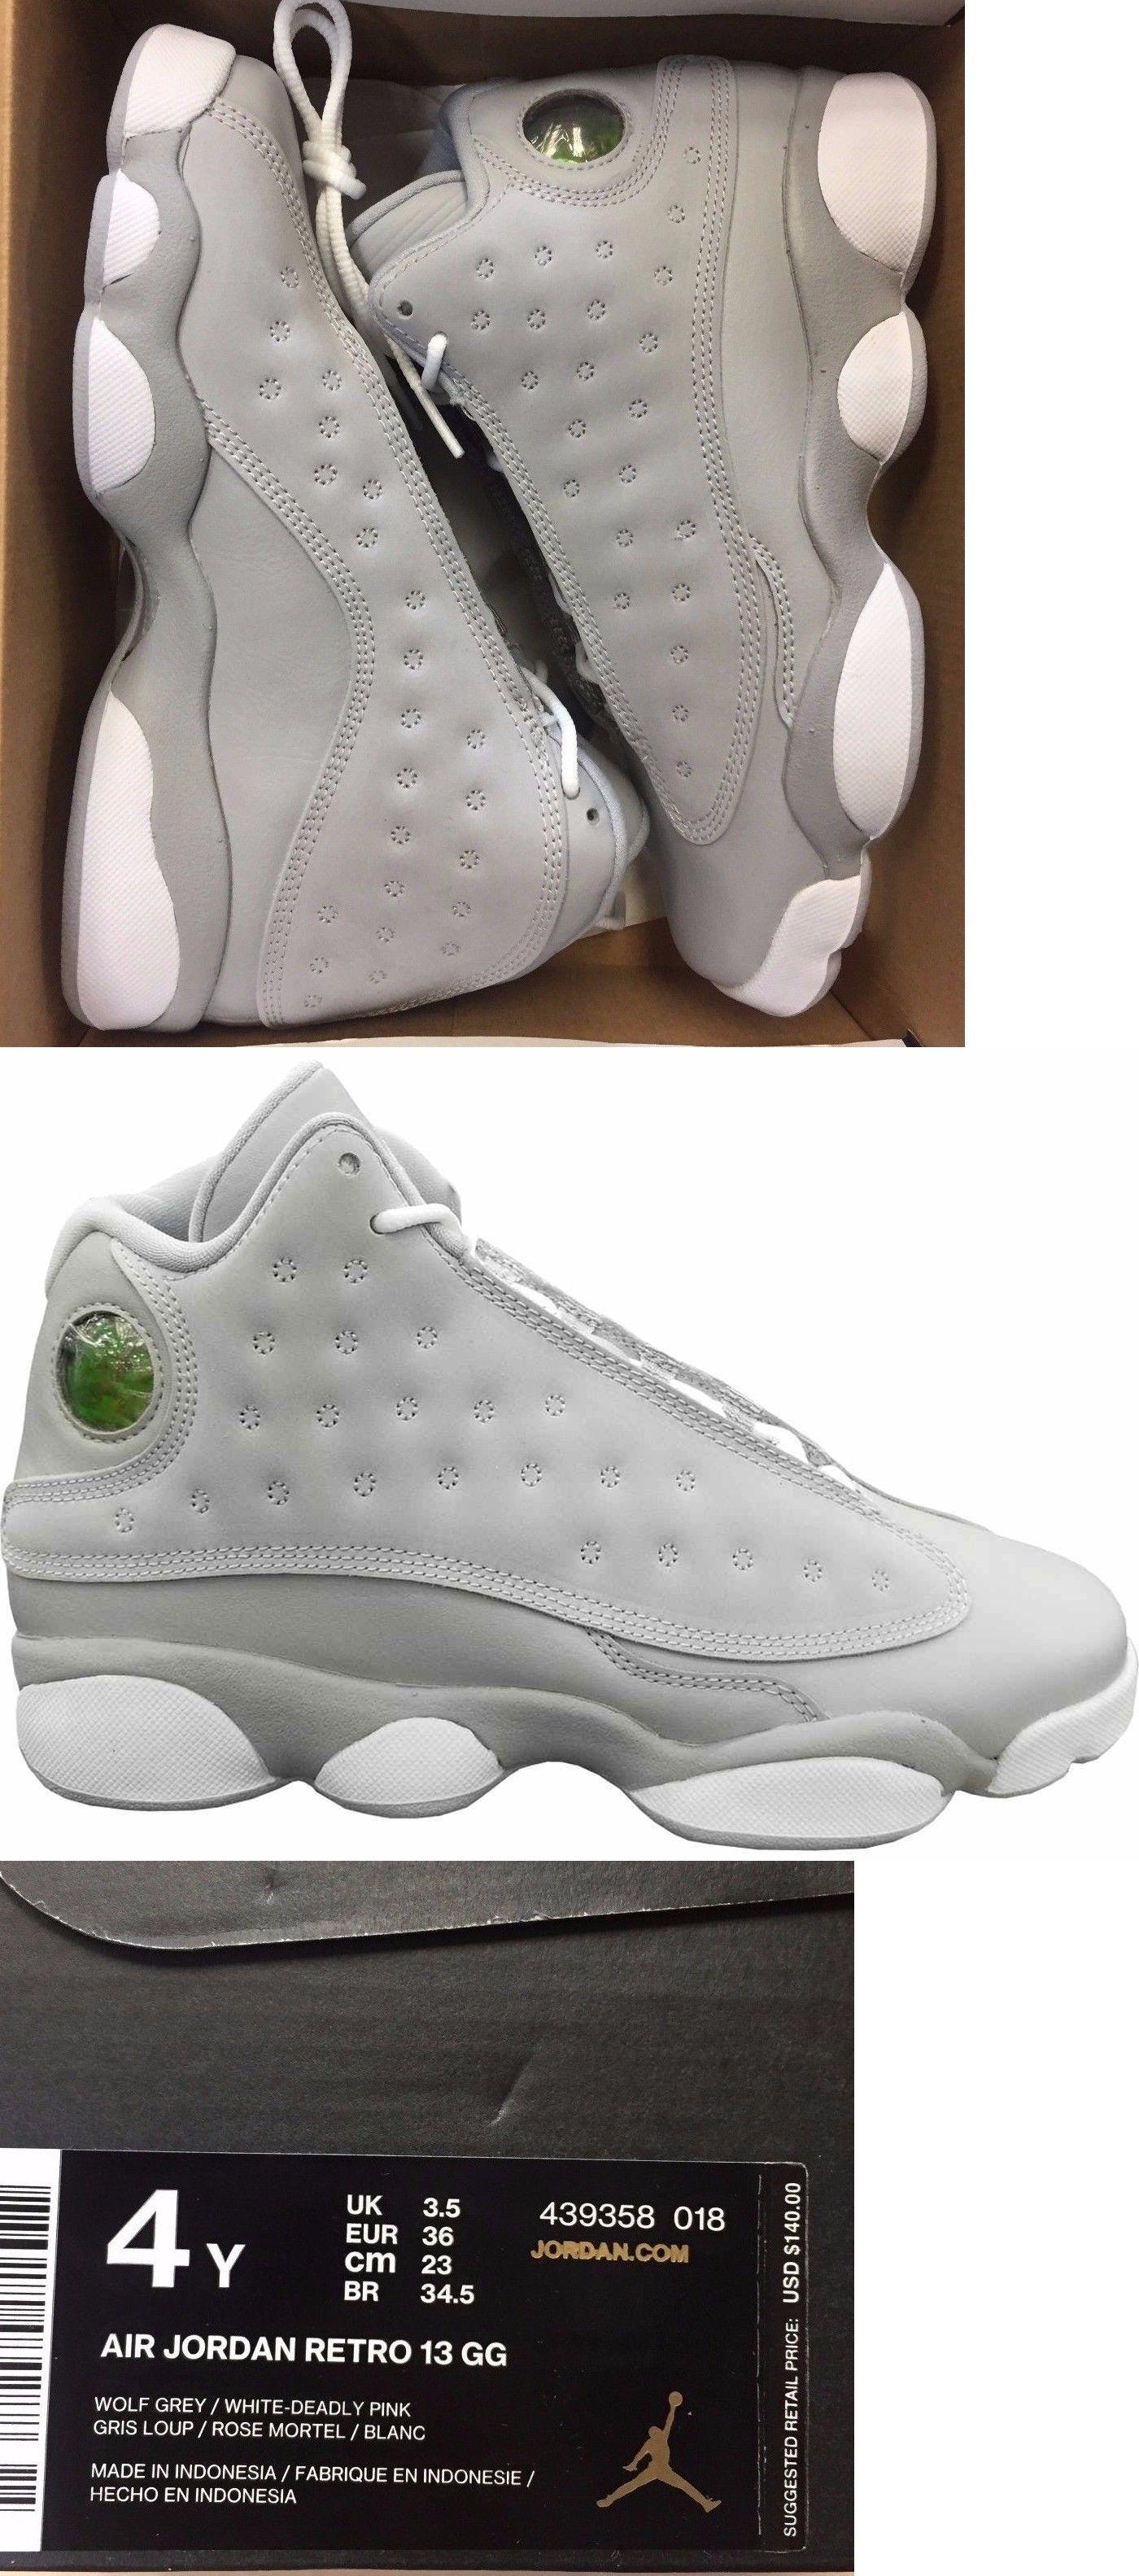 Girls Shoes 57974: Nike Air Jordan Retro 13 Xiii Wolf Grey Deadly Pink  Hyper 439358